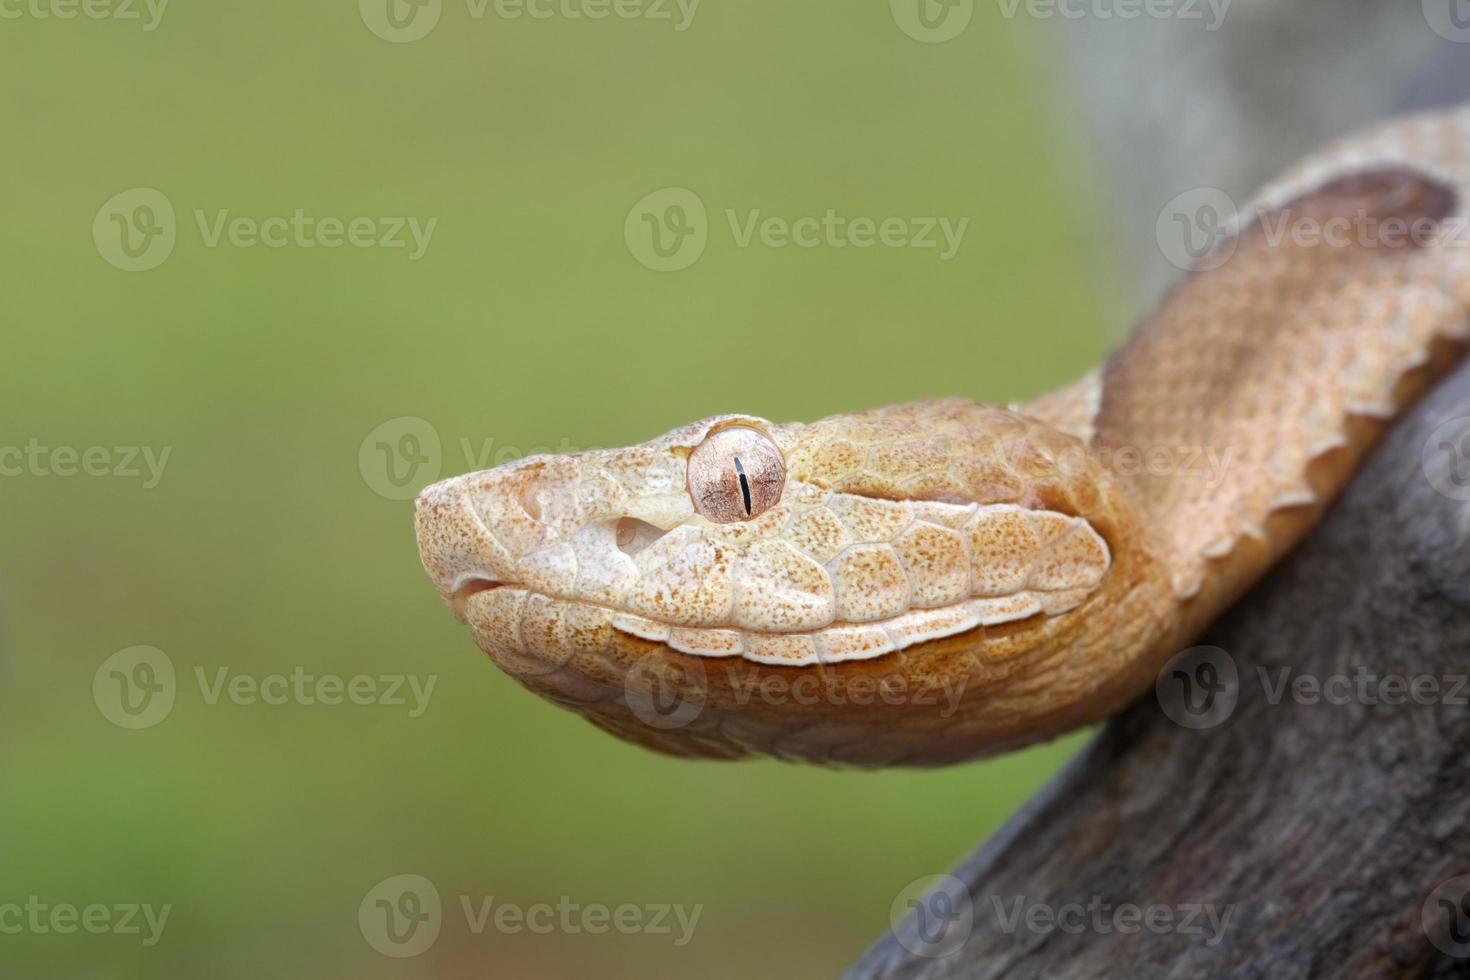 Southern Copperhead Snake photo